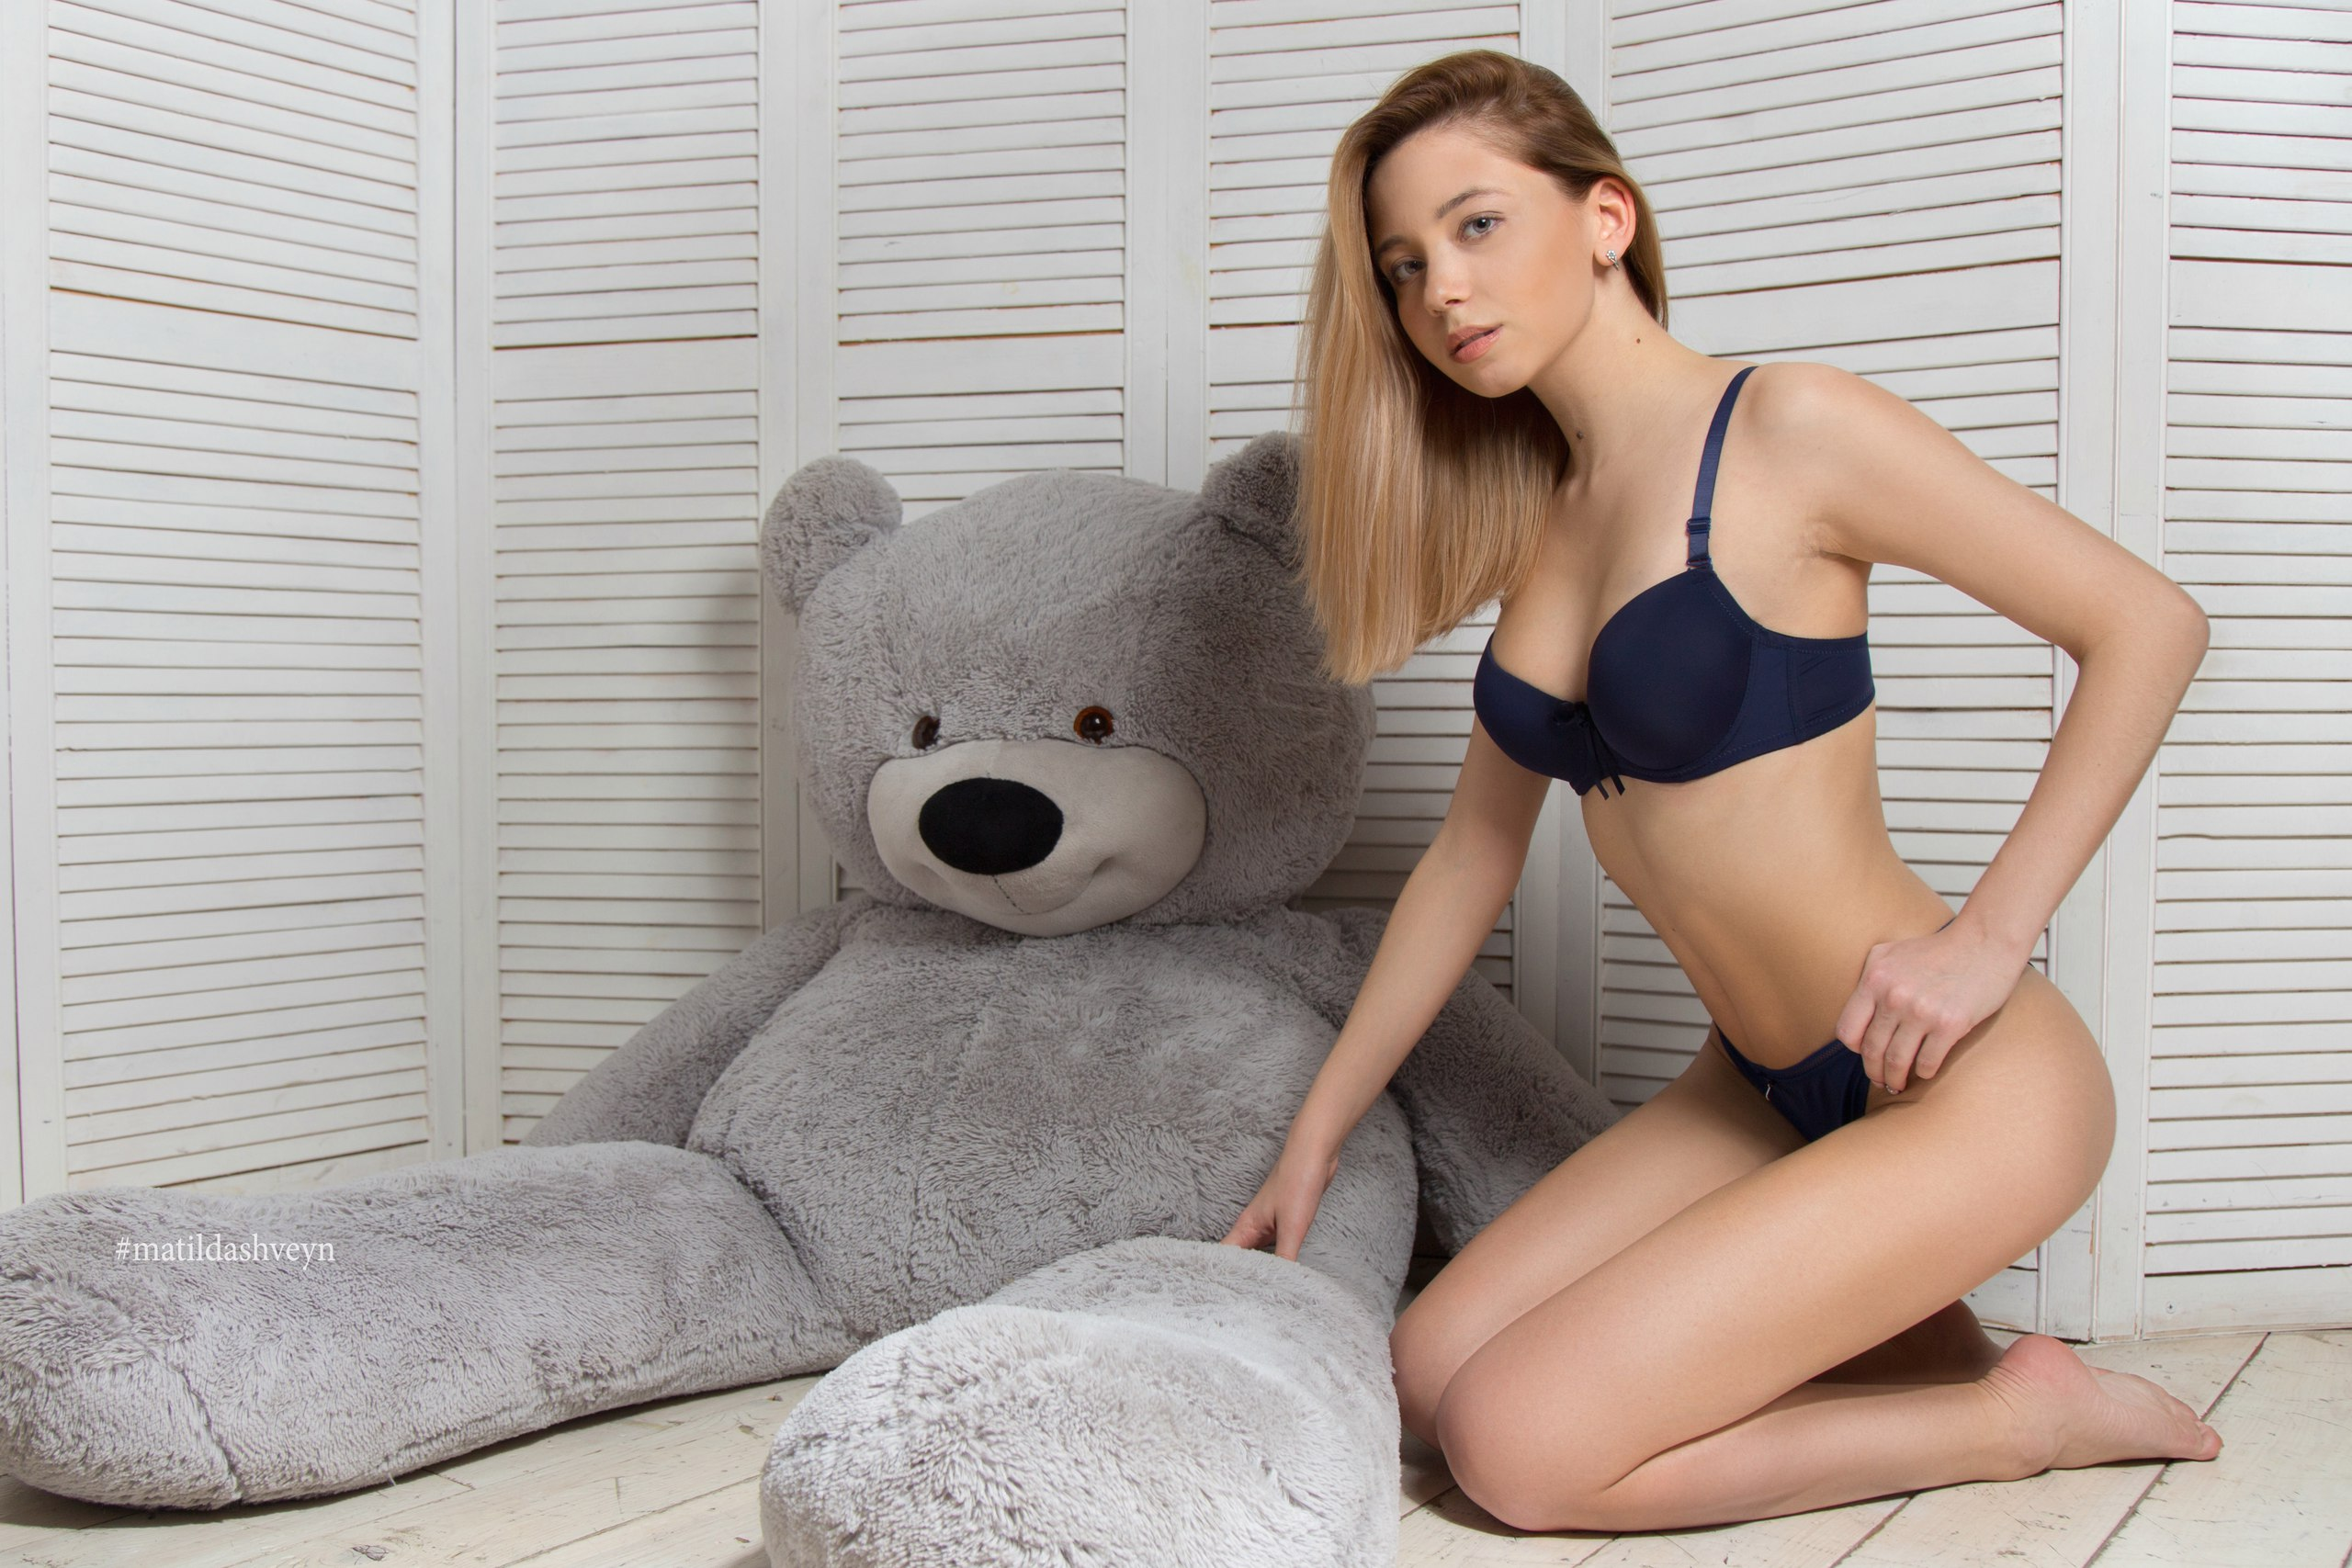 People 2560x1707 women blonde on the floor pink lipstick blue lingerie belly teddy bears ass brunette kneeling Matilda Shveyn barefoot young woman